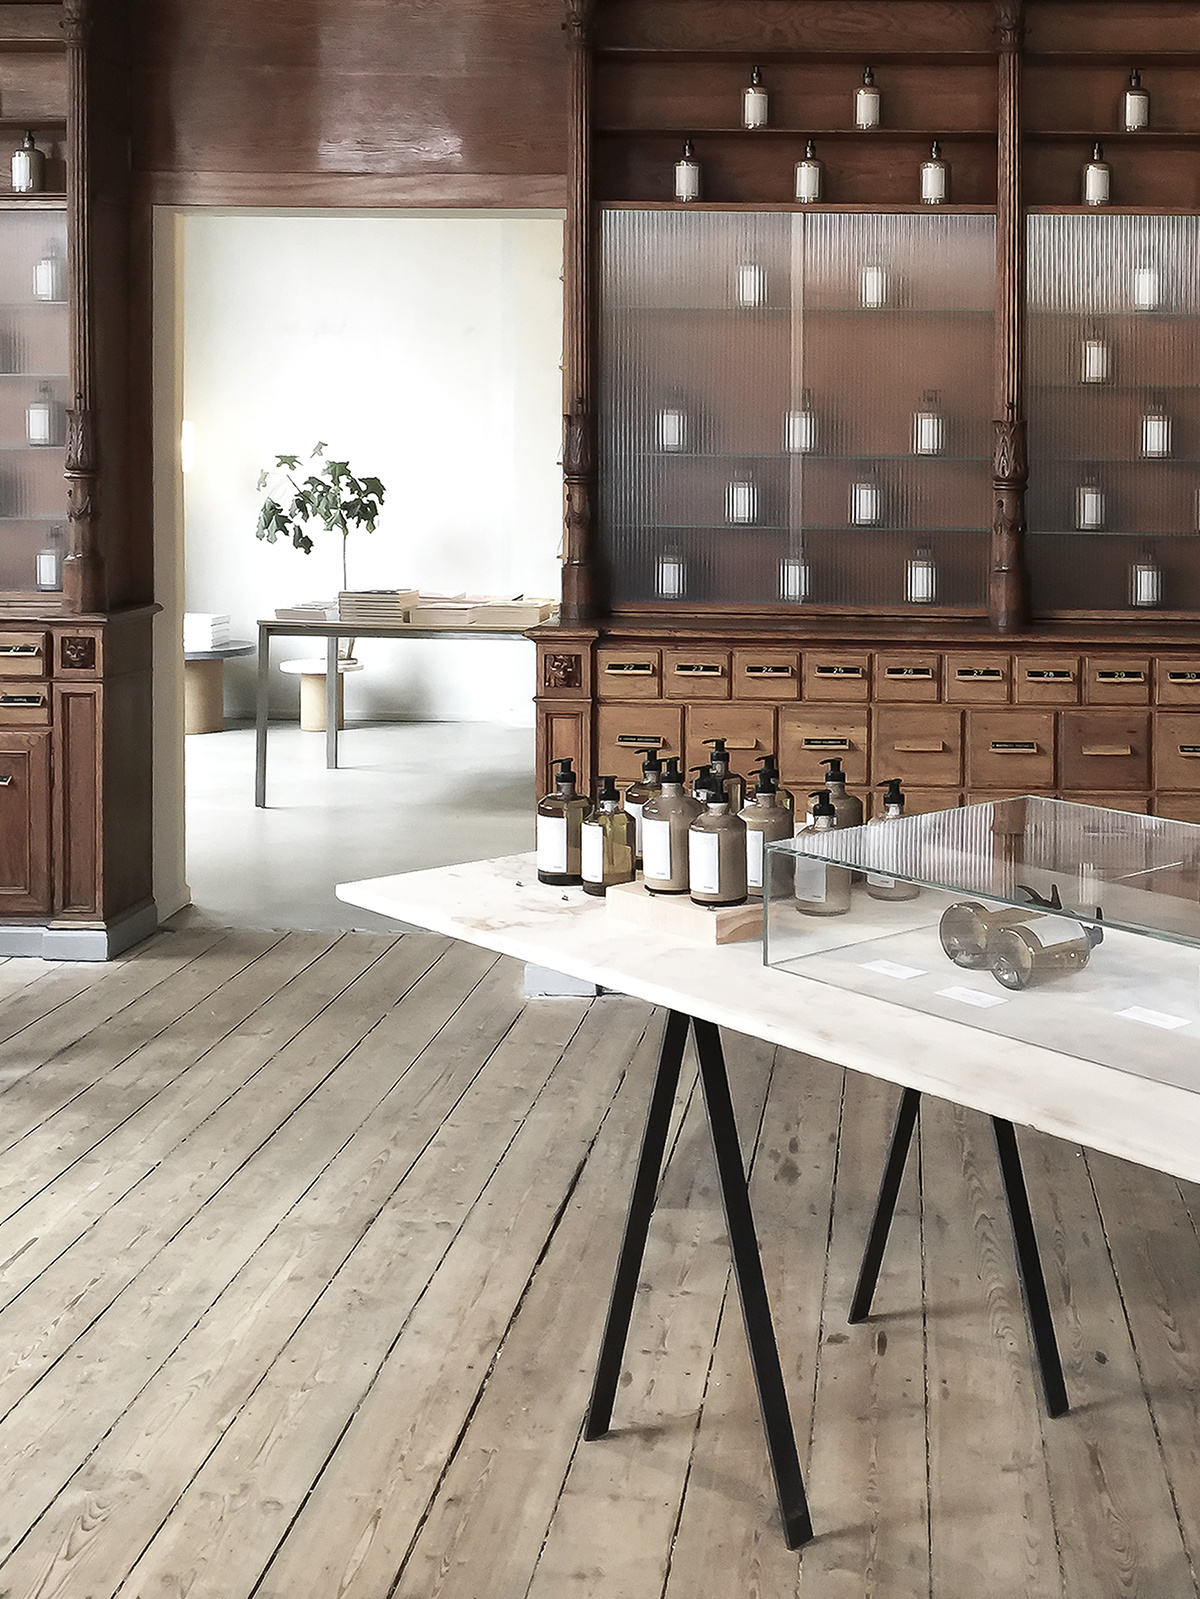 DESIGN_  FRAMA.  #Pharmacy #Lotion #Furniture #Soap #Interiors    https://framacph.com